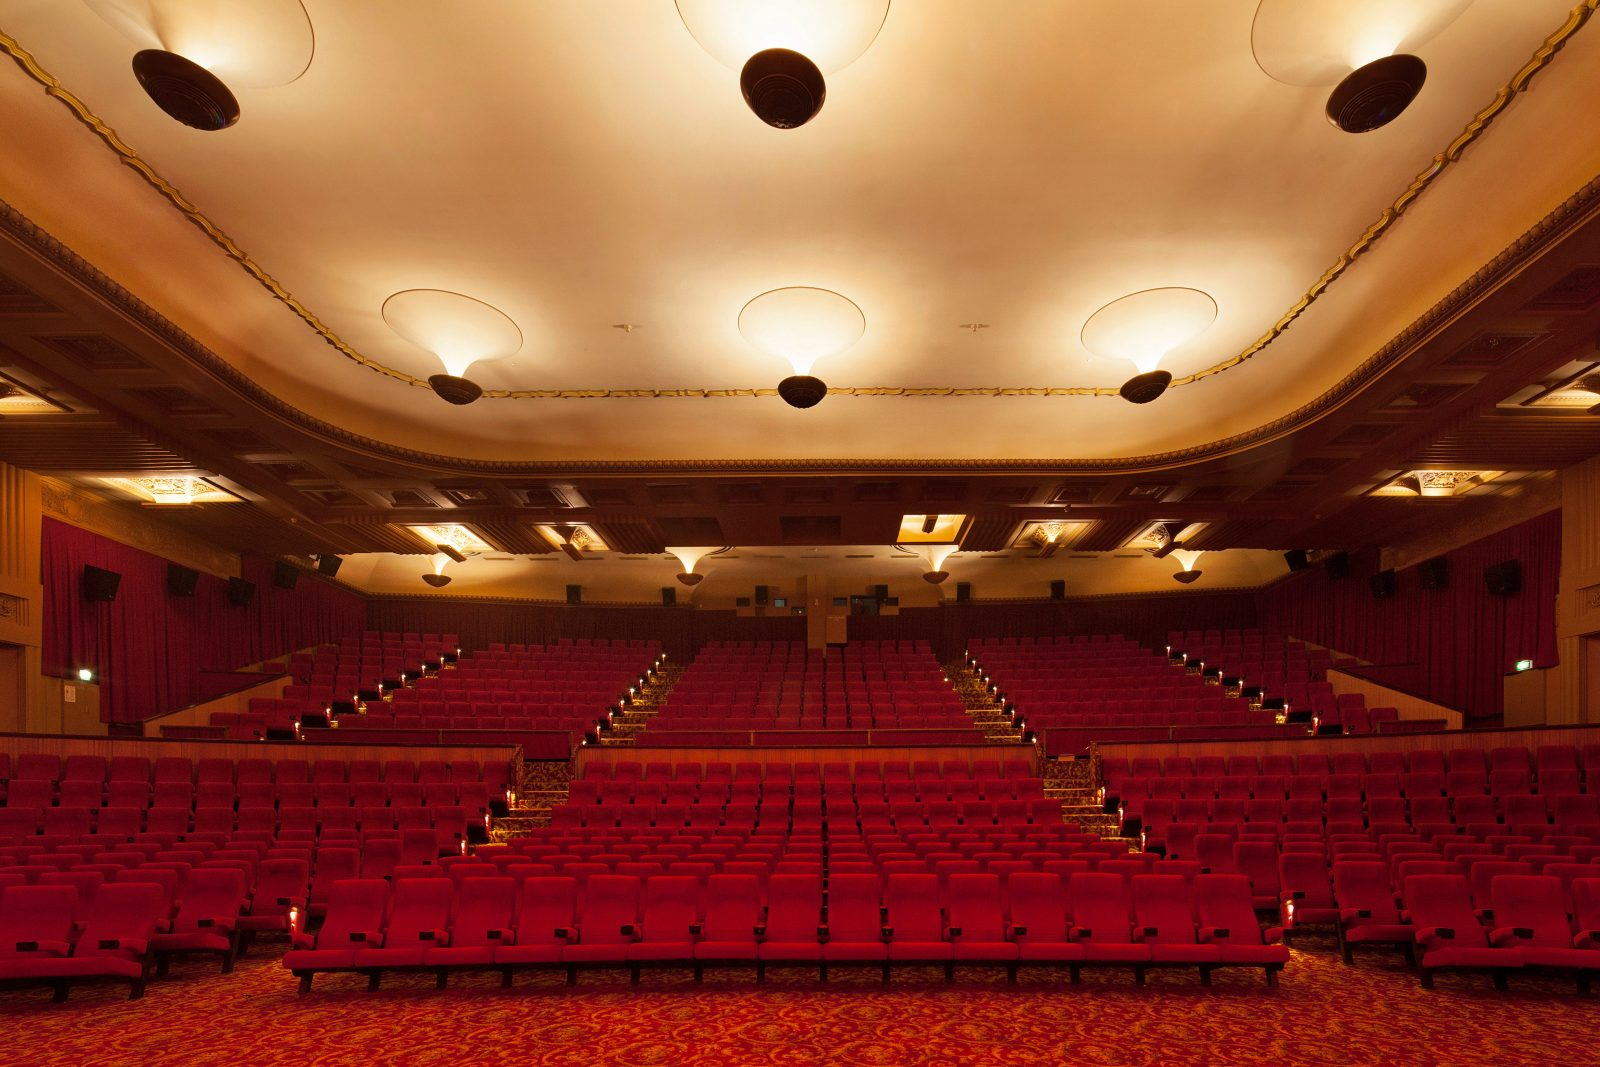 The historic Cinema 1, Seating 700+ admits